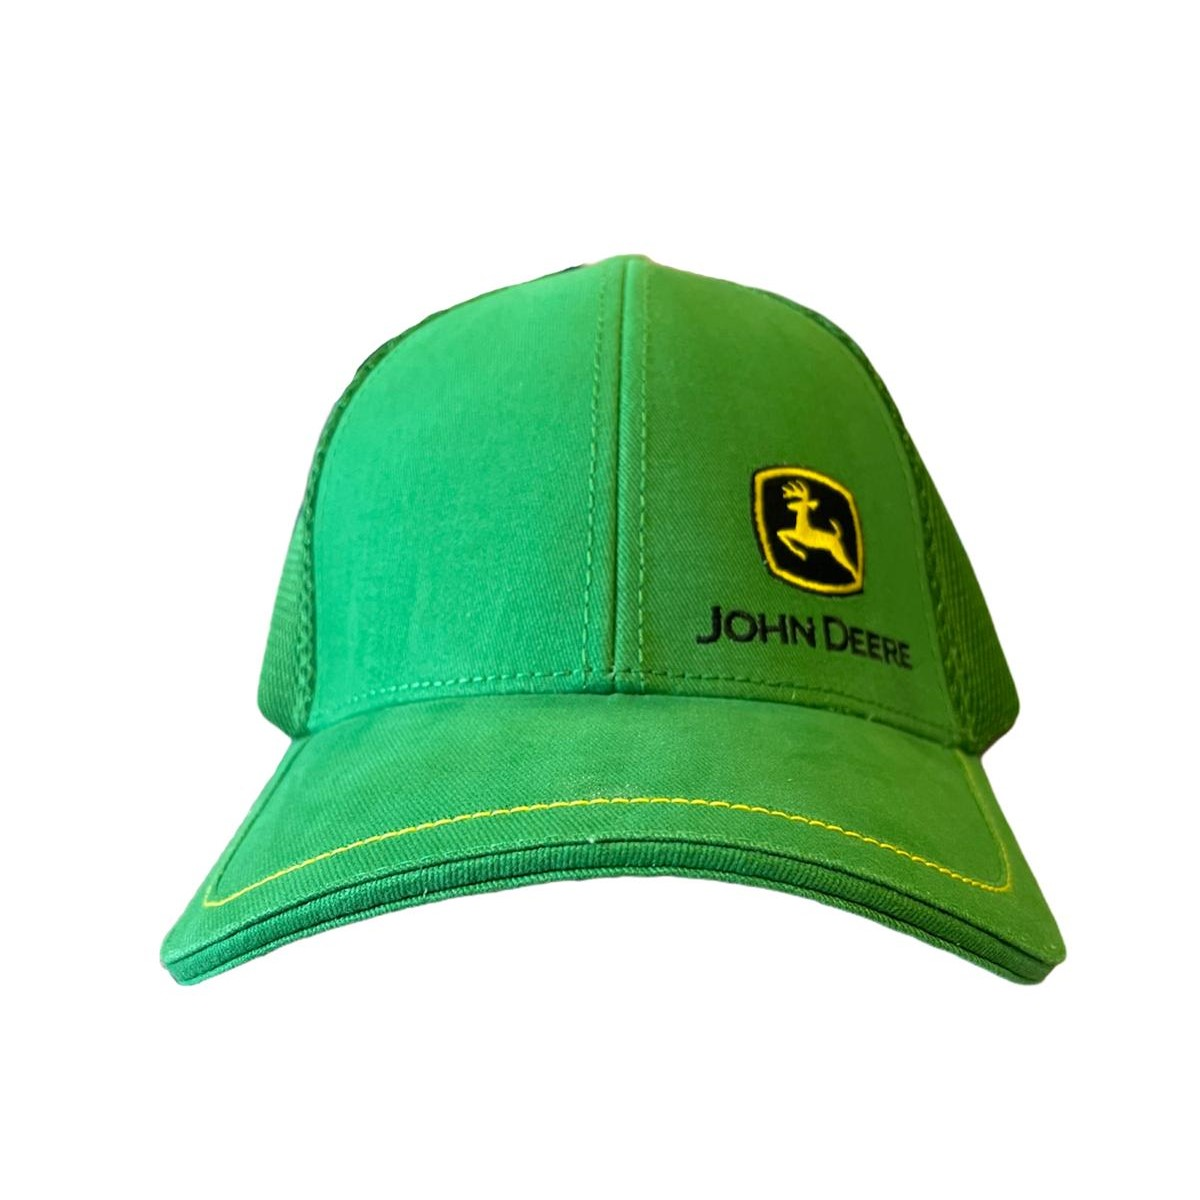 Cappellino John Deere verde Mesh con logo